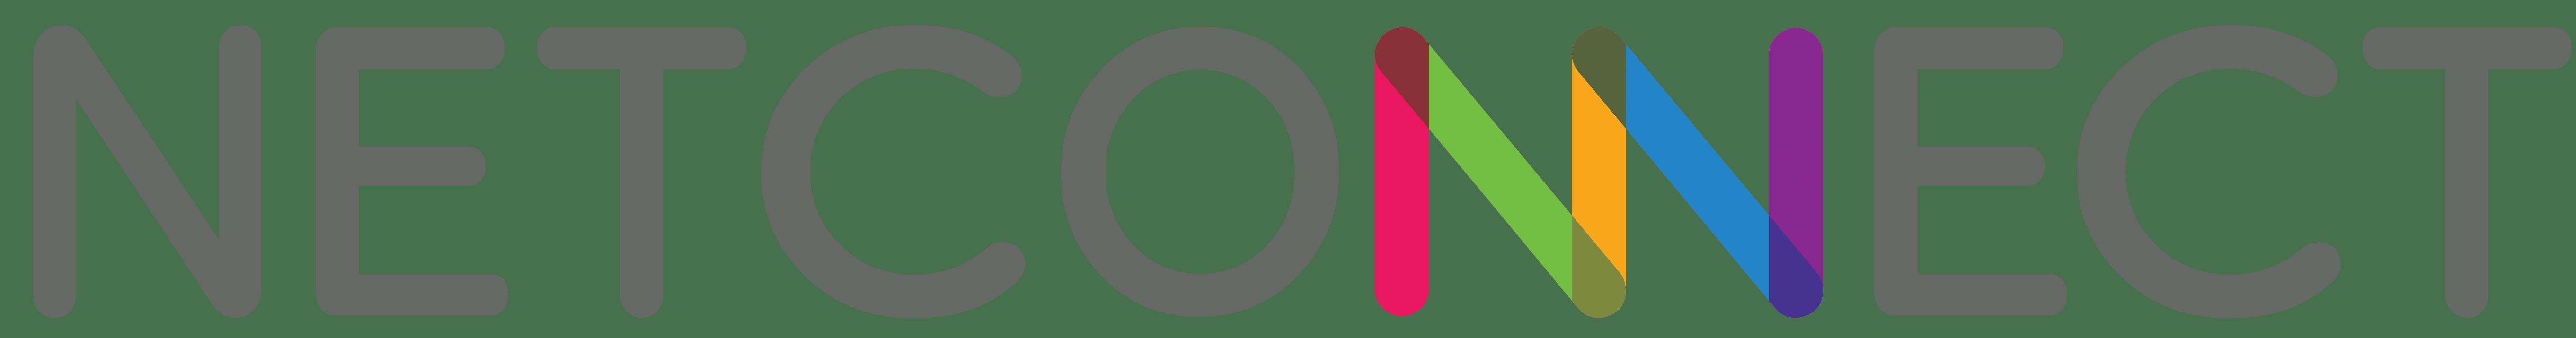 netconnect words logo